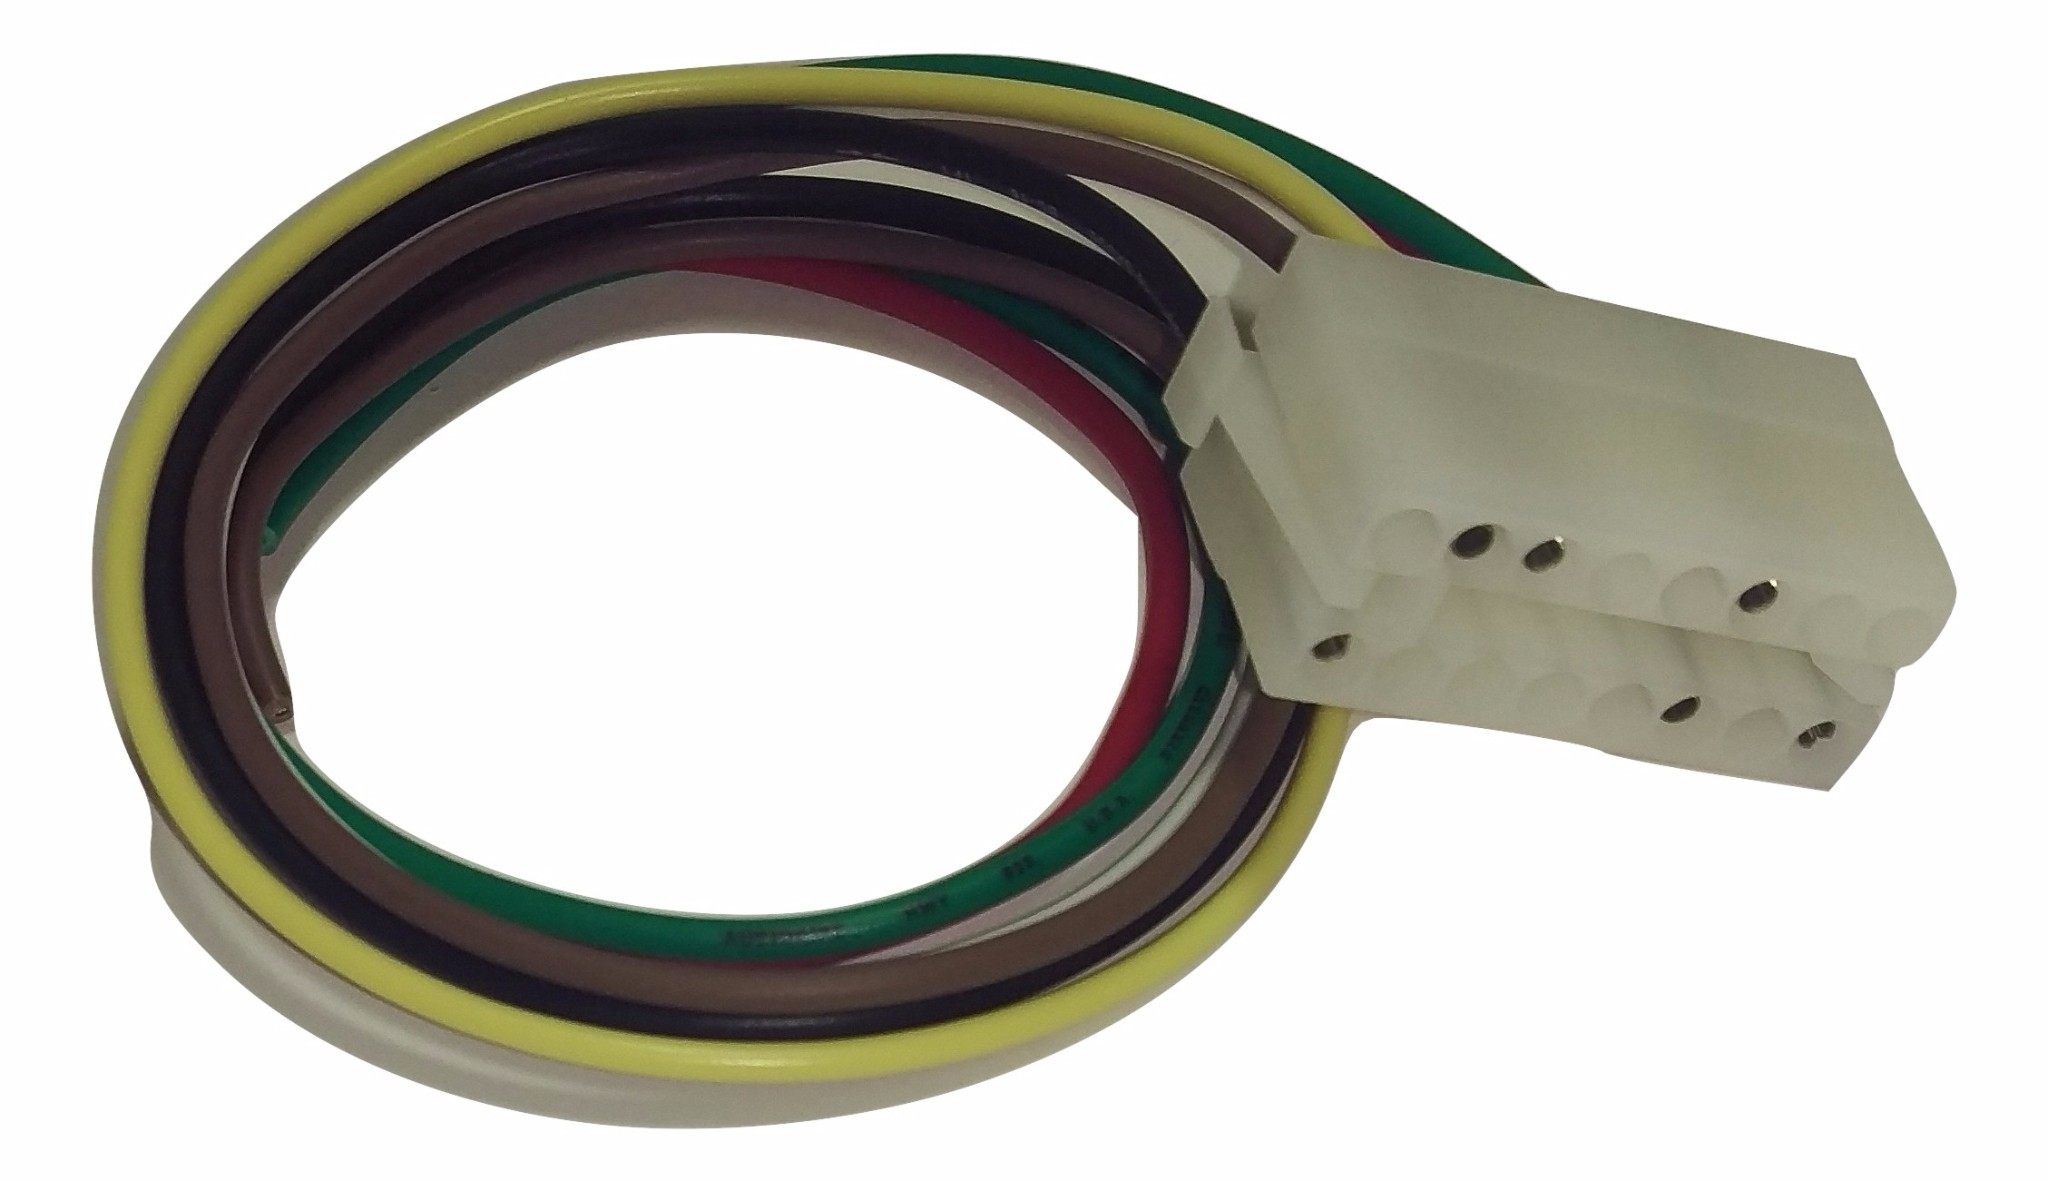 Whelen Power Harness Plug Cable 16 Pin Cencom Epsilon EPSL1911 Emergency Supply